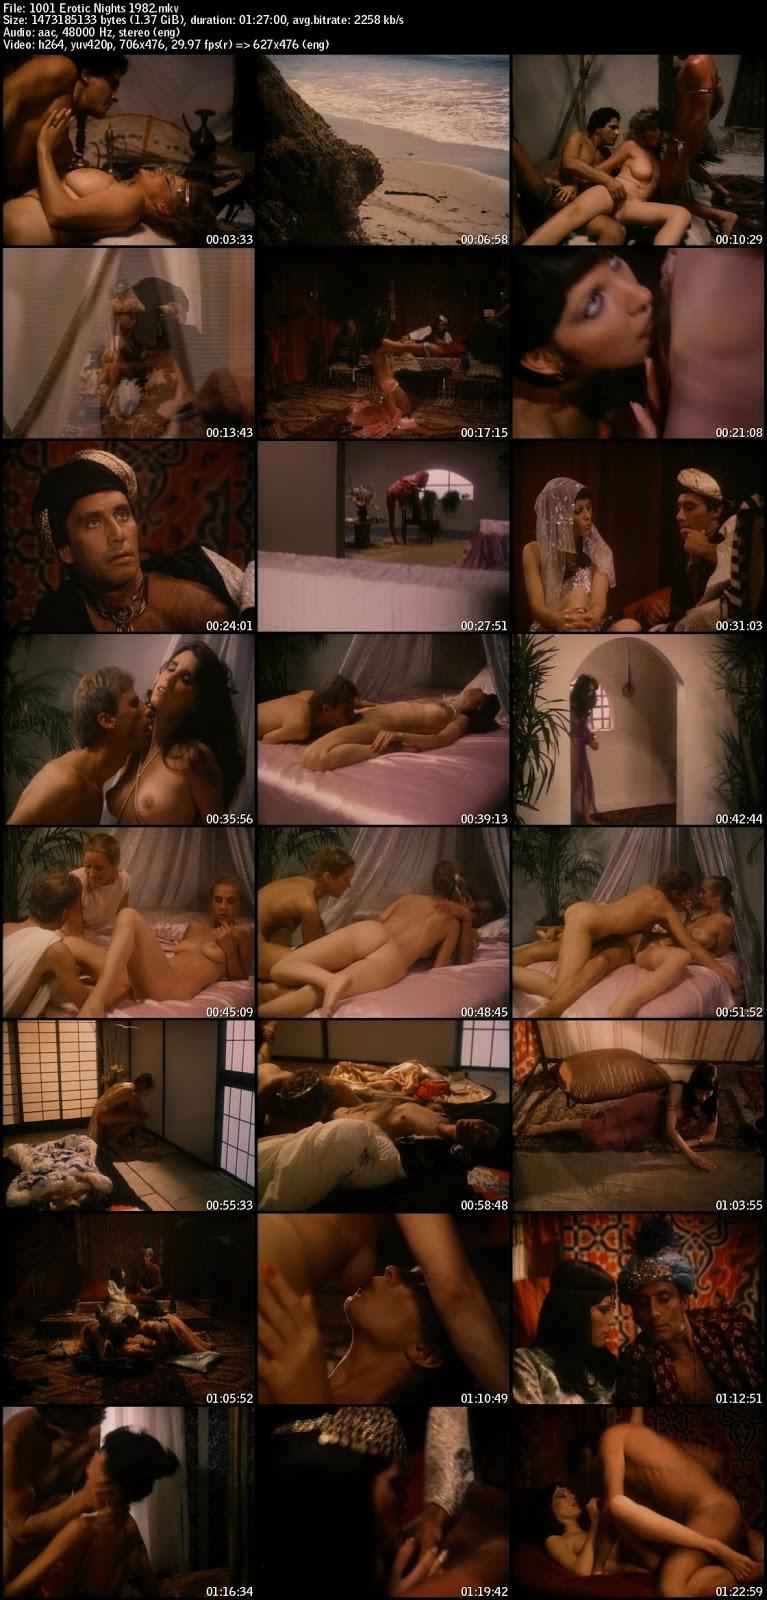 eroticheskie-filmi-kanala-russkaya-noch